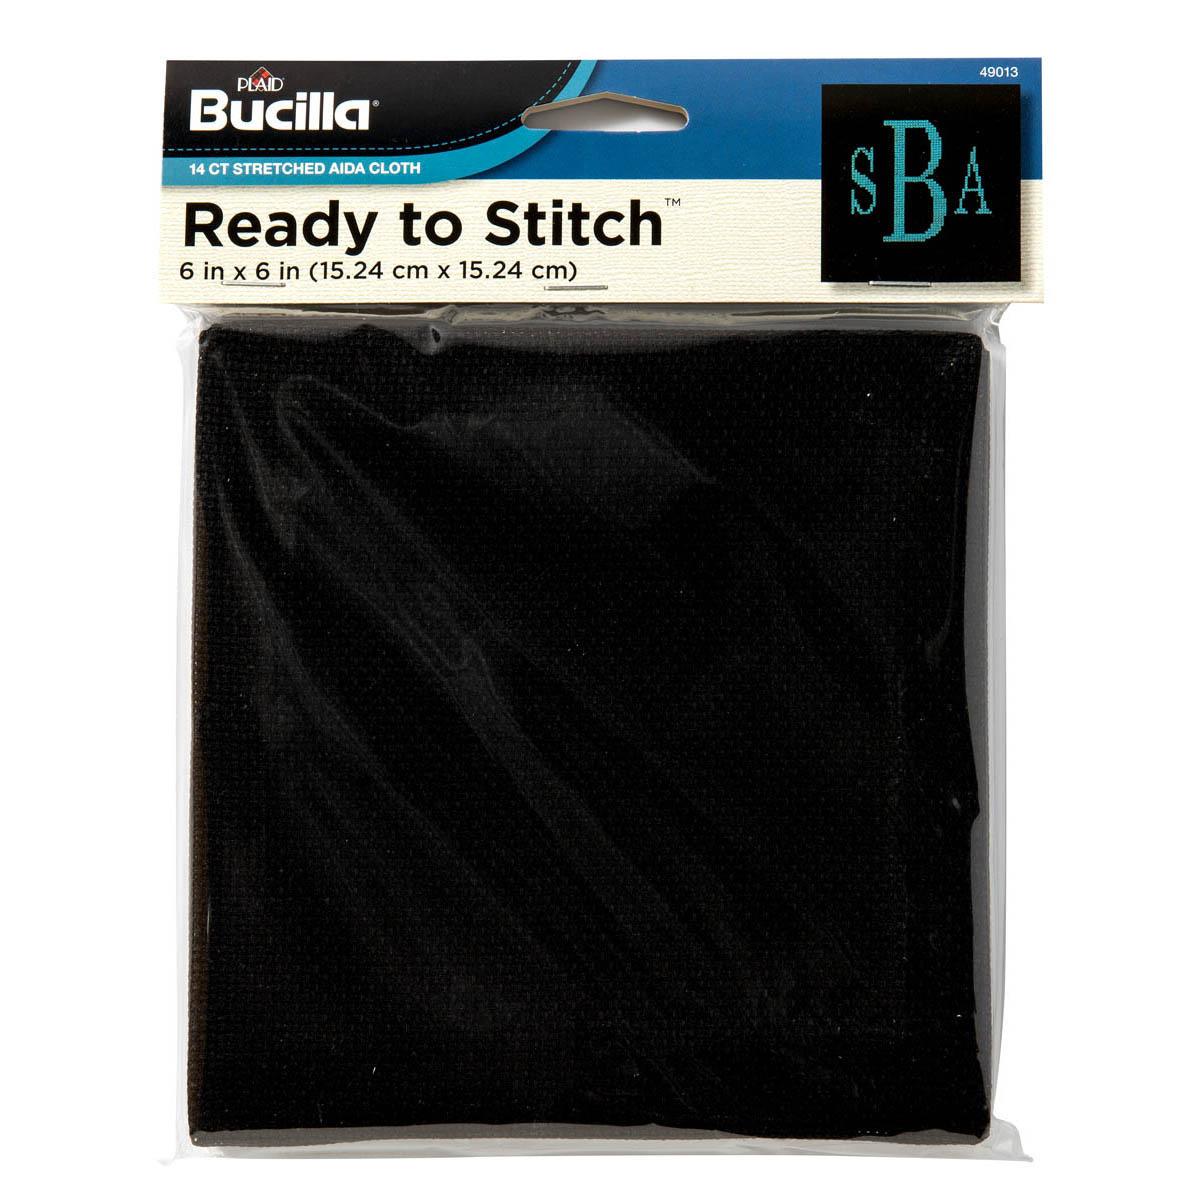 Bucilla ® Ready to Stitch™ Blanks - Counted Cross Stitch - Black, 6